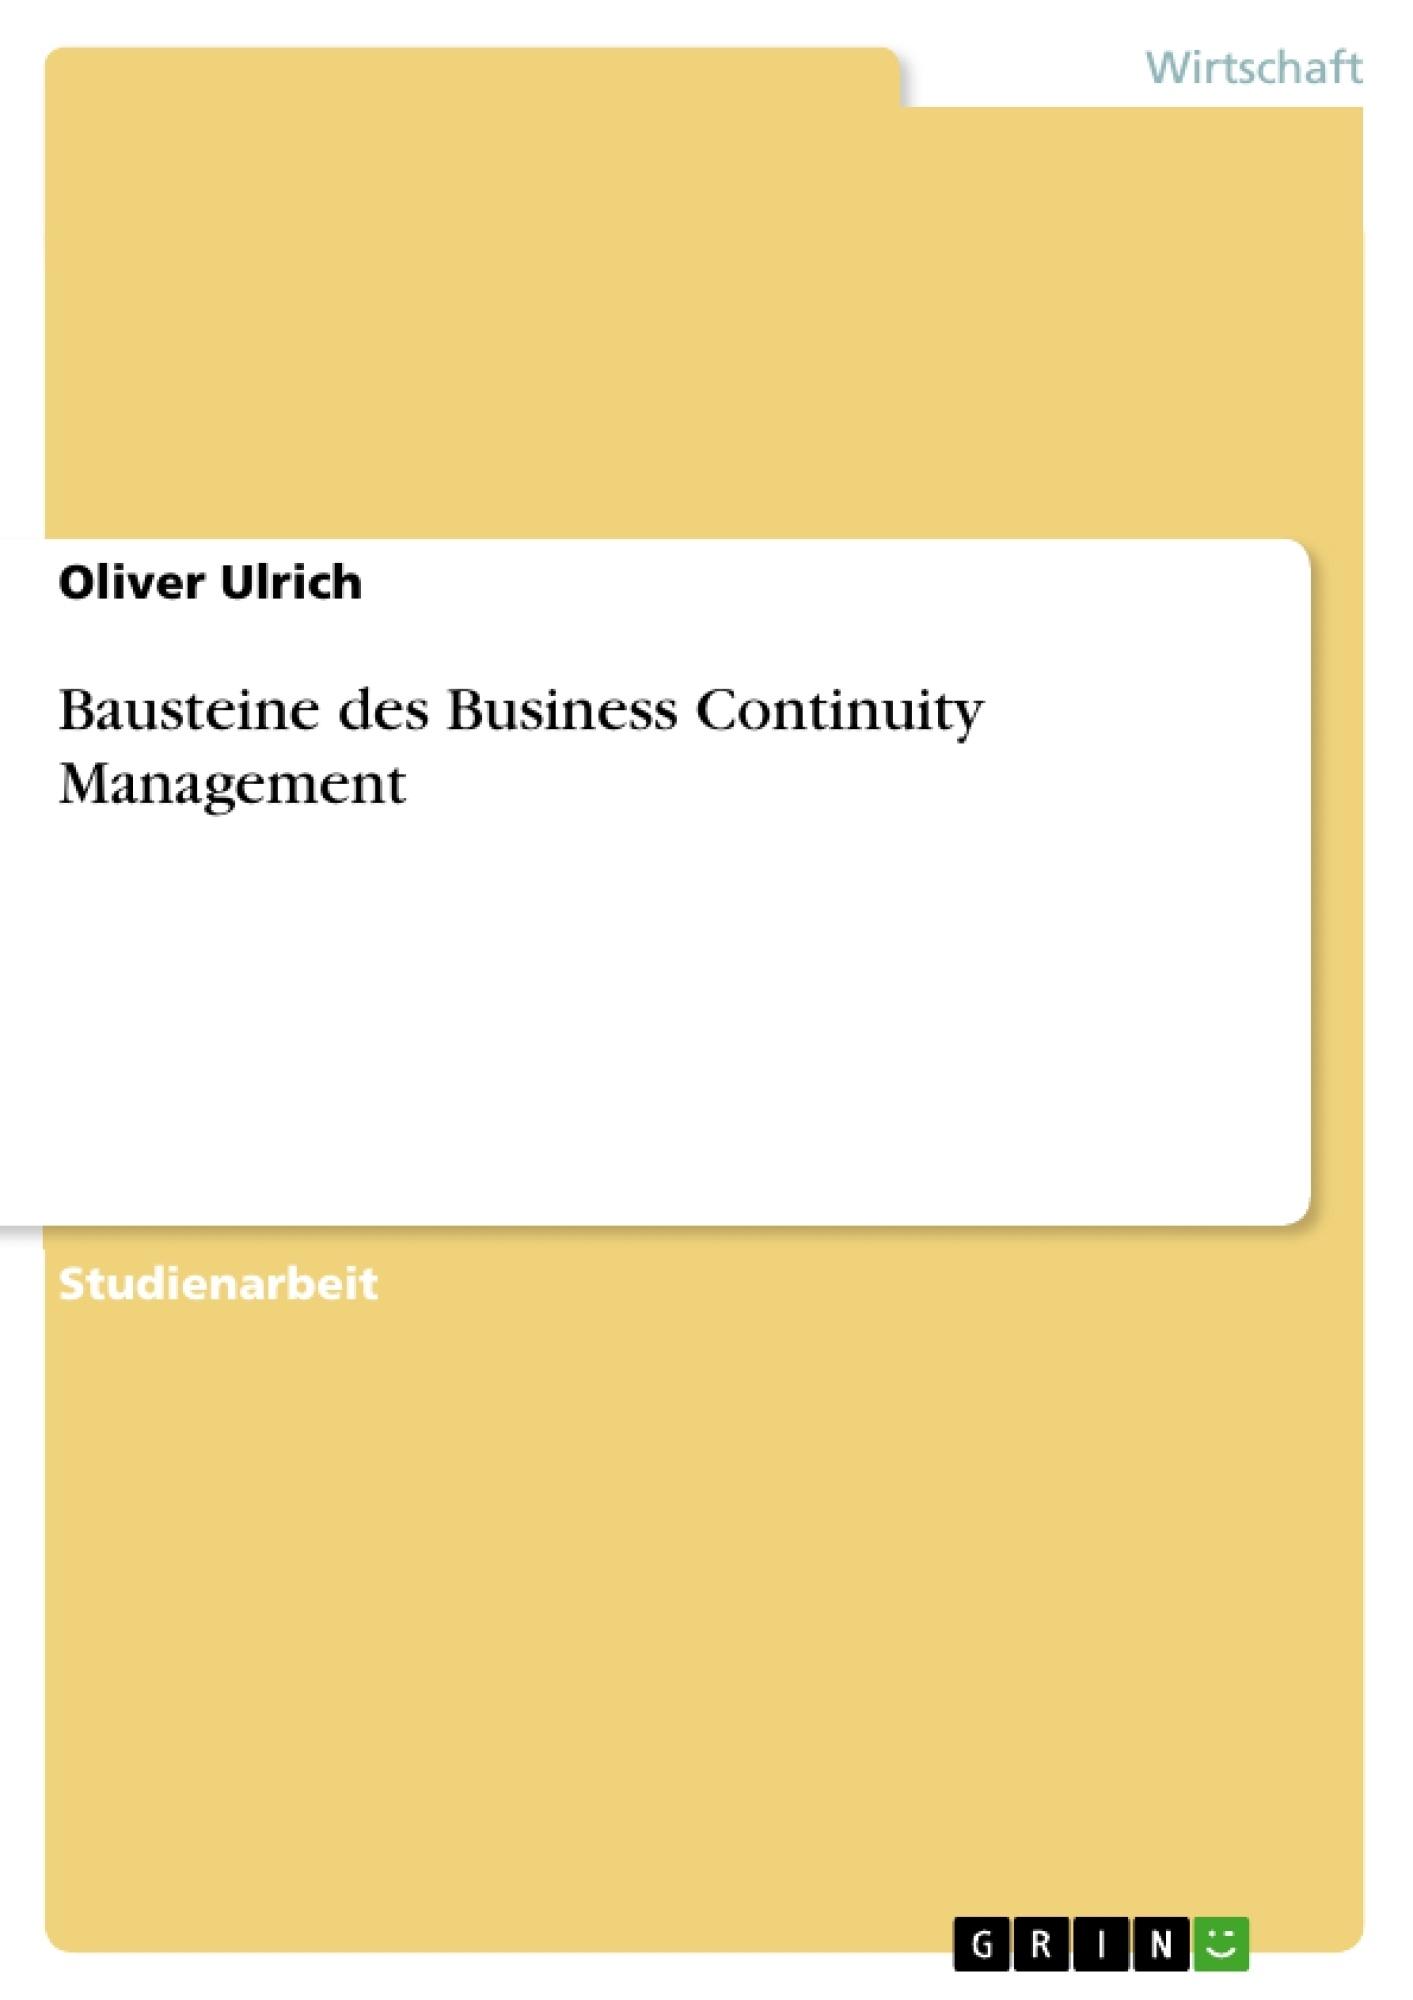 Titel: Bausteine des Business Continuity Management